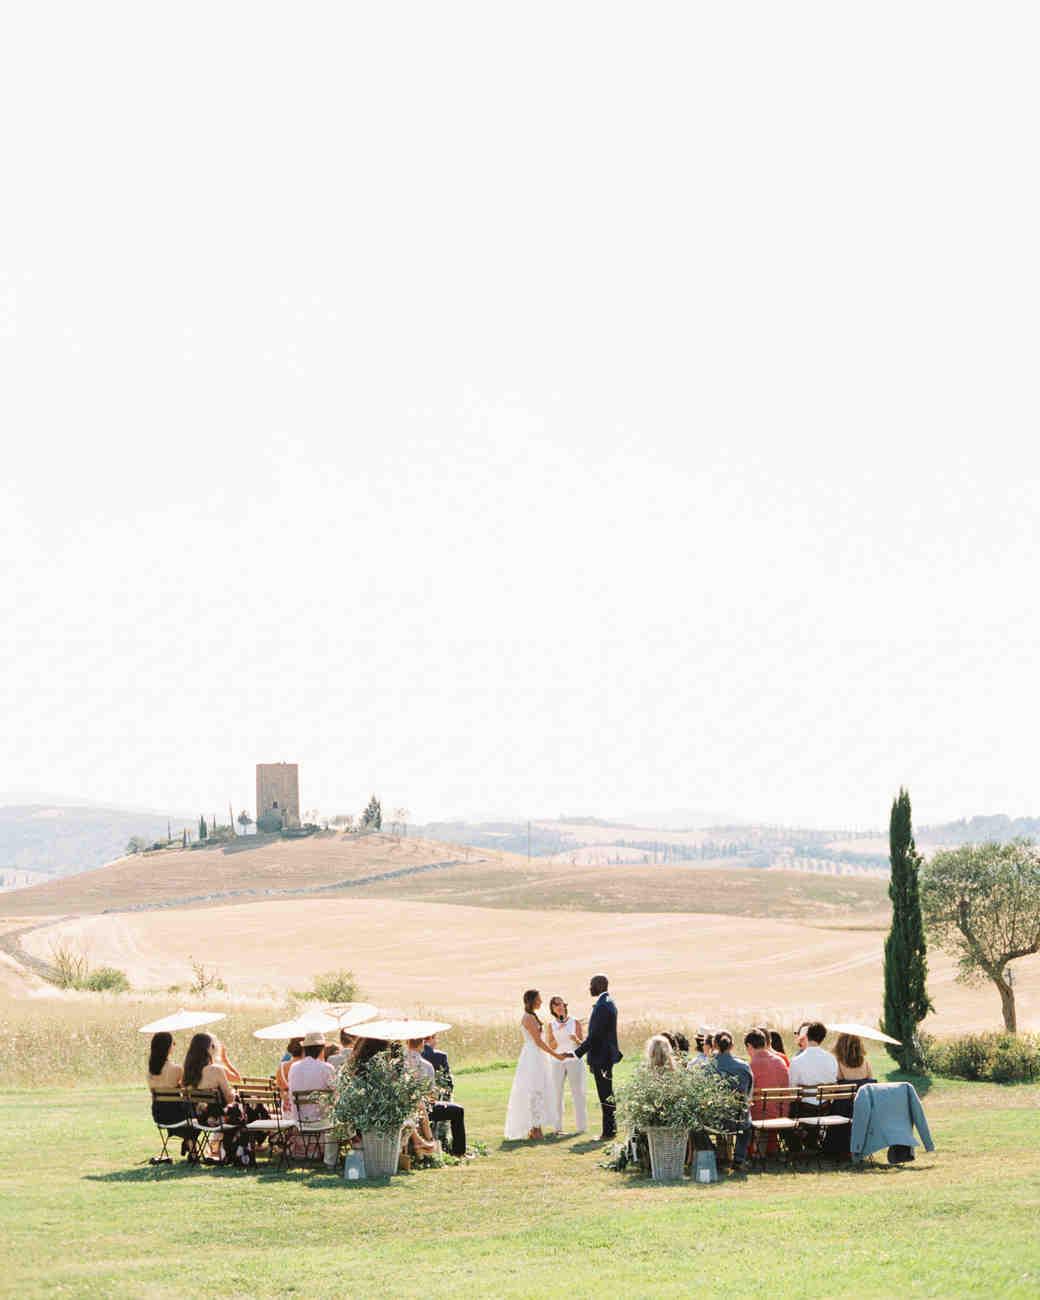 leila joel wedding ceremony